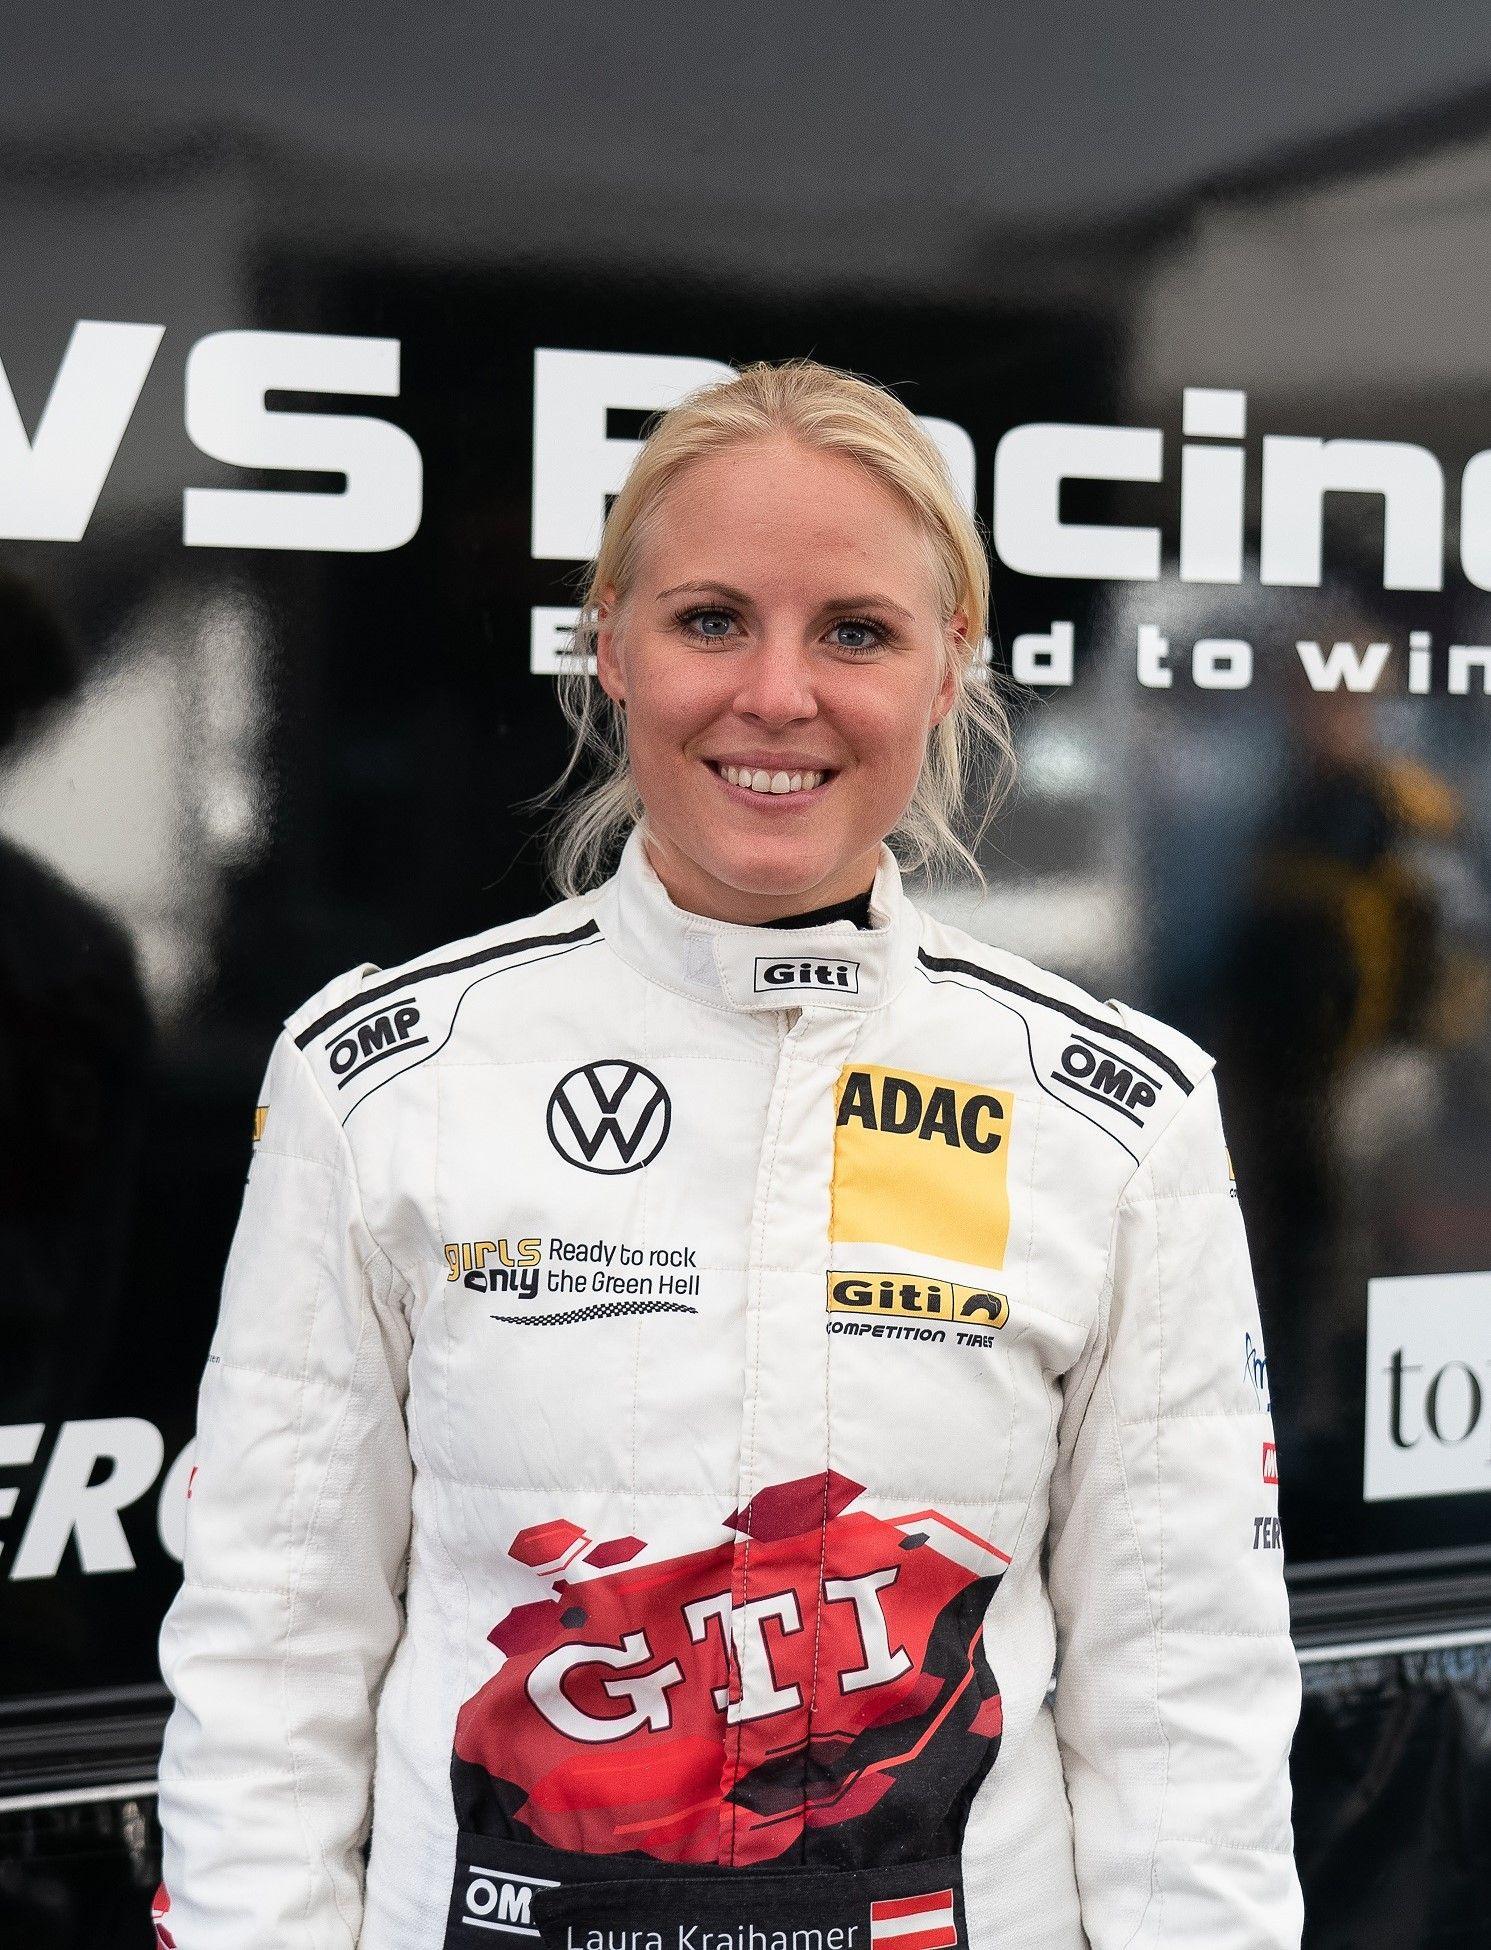 Fotografia Laura Kraihamer, piloto de carreras en el equipo